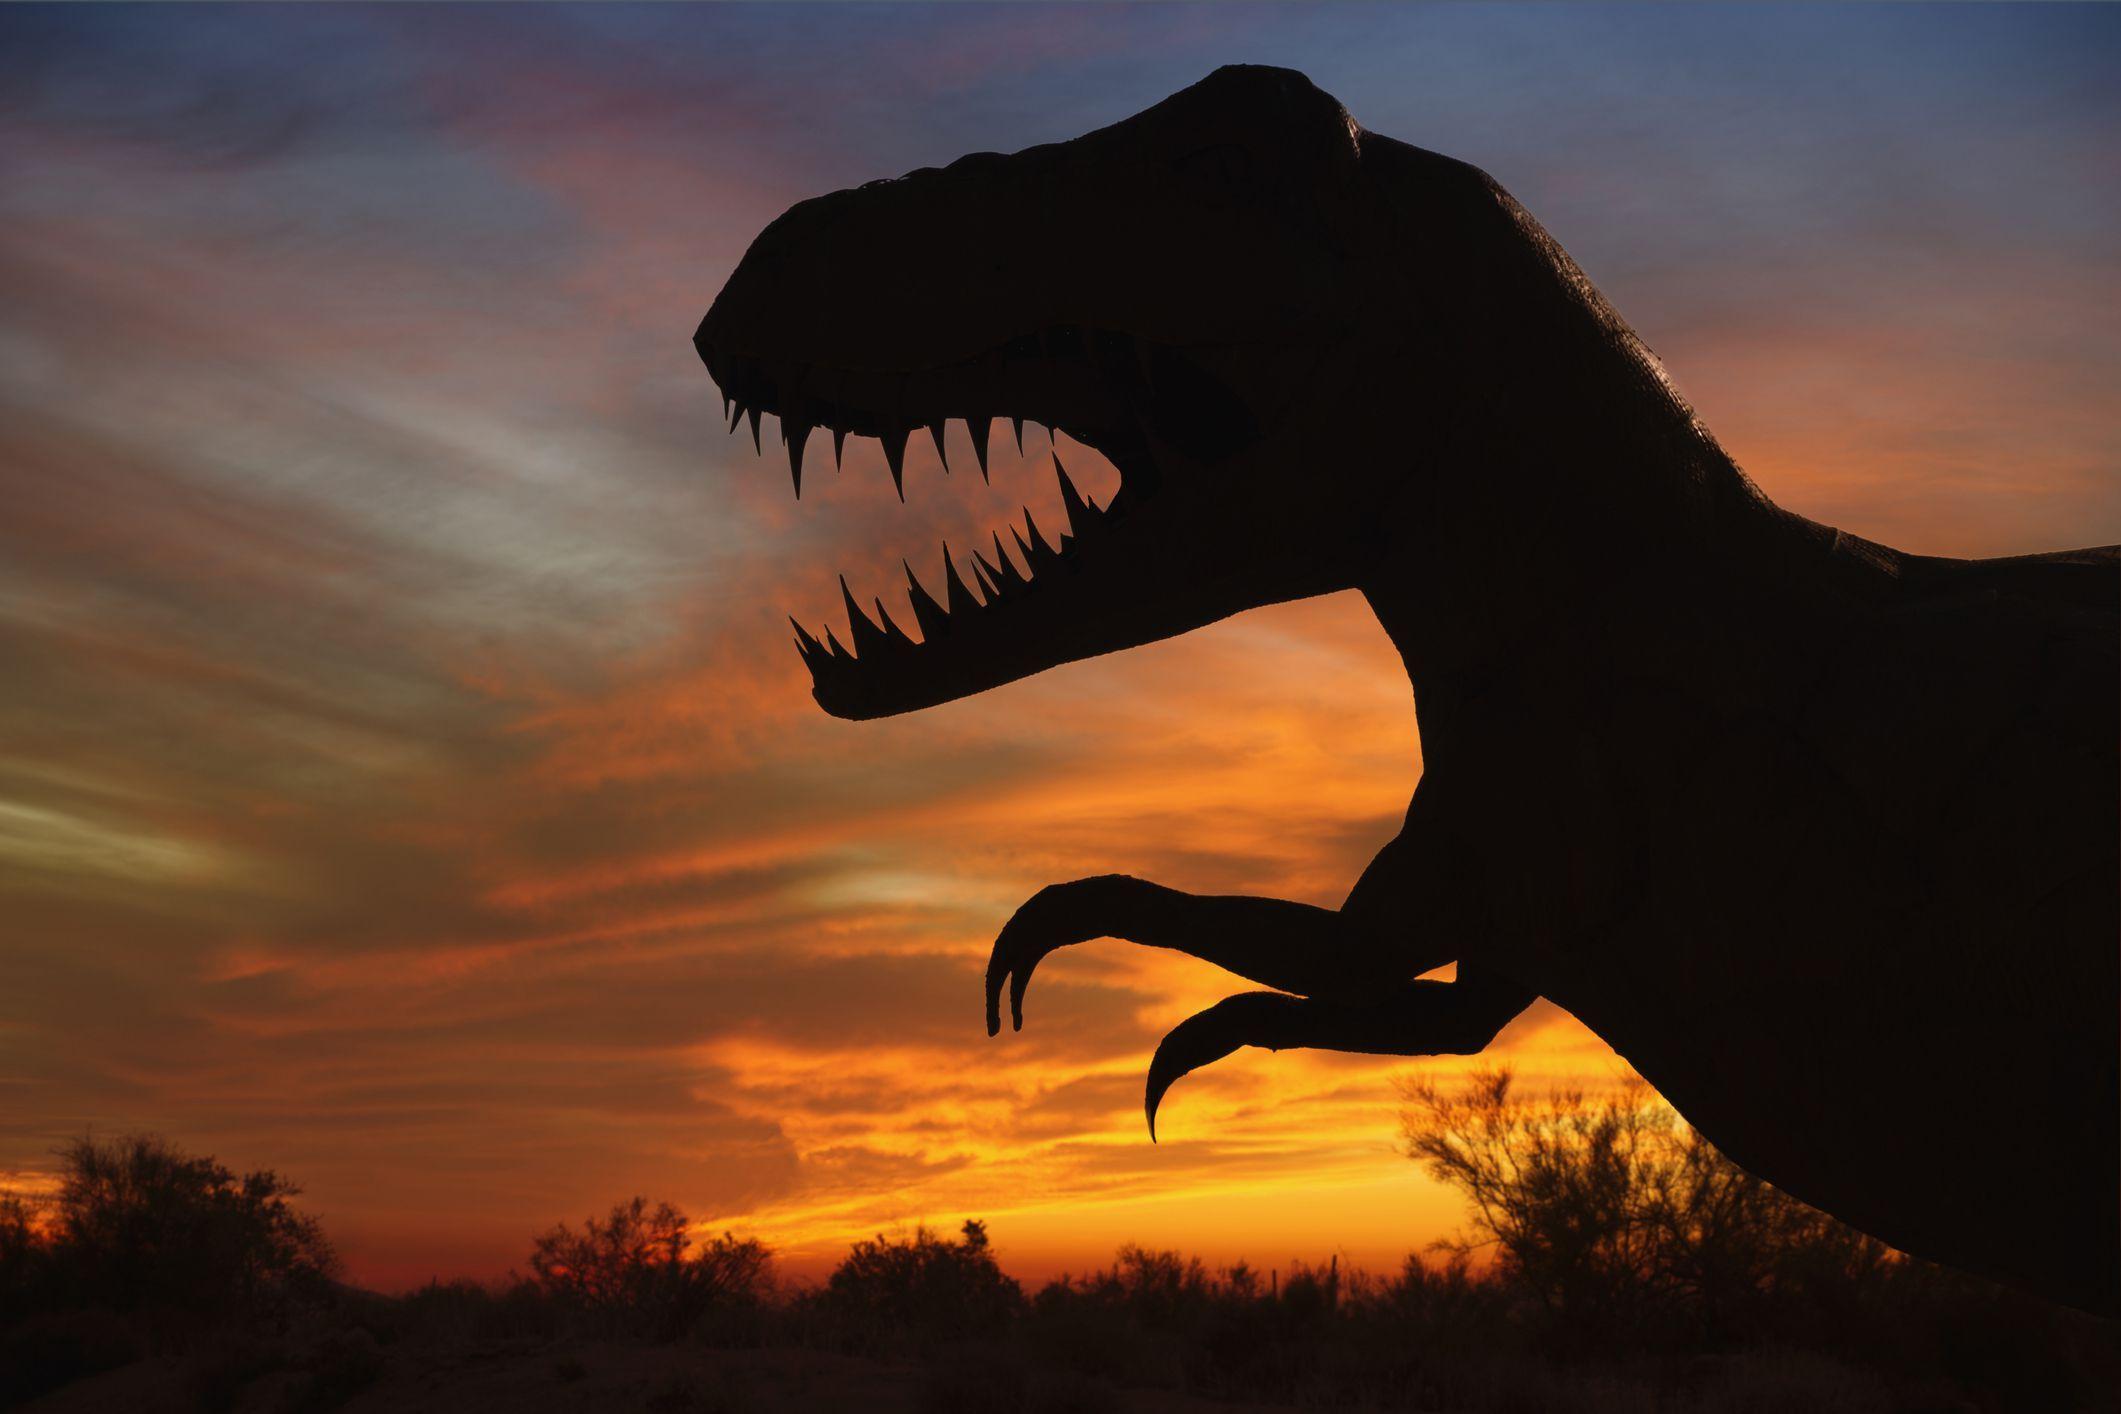 The Mesozoic Era's Deadliest Dinos in 2020 Dinosaur park